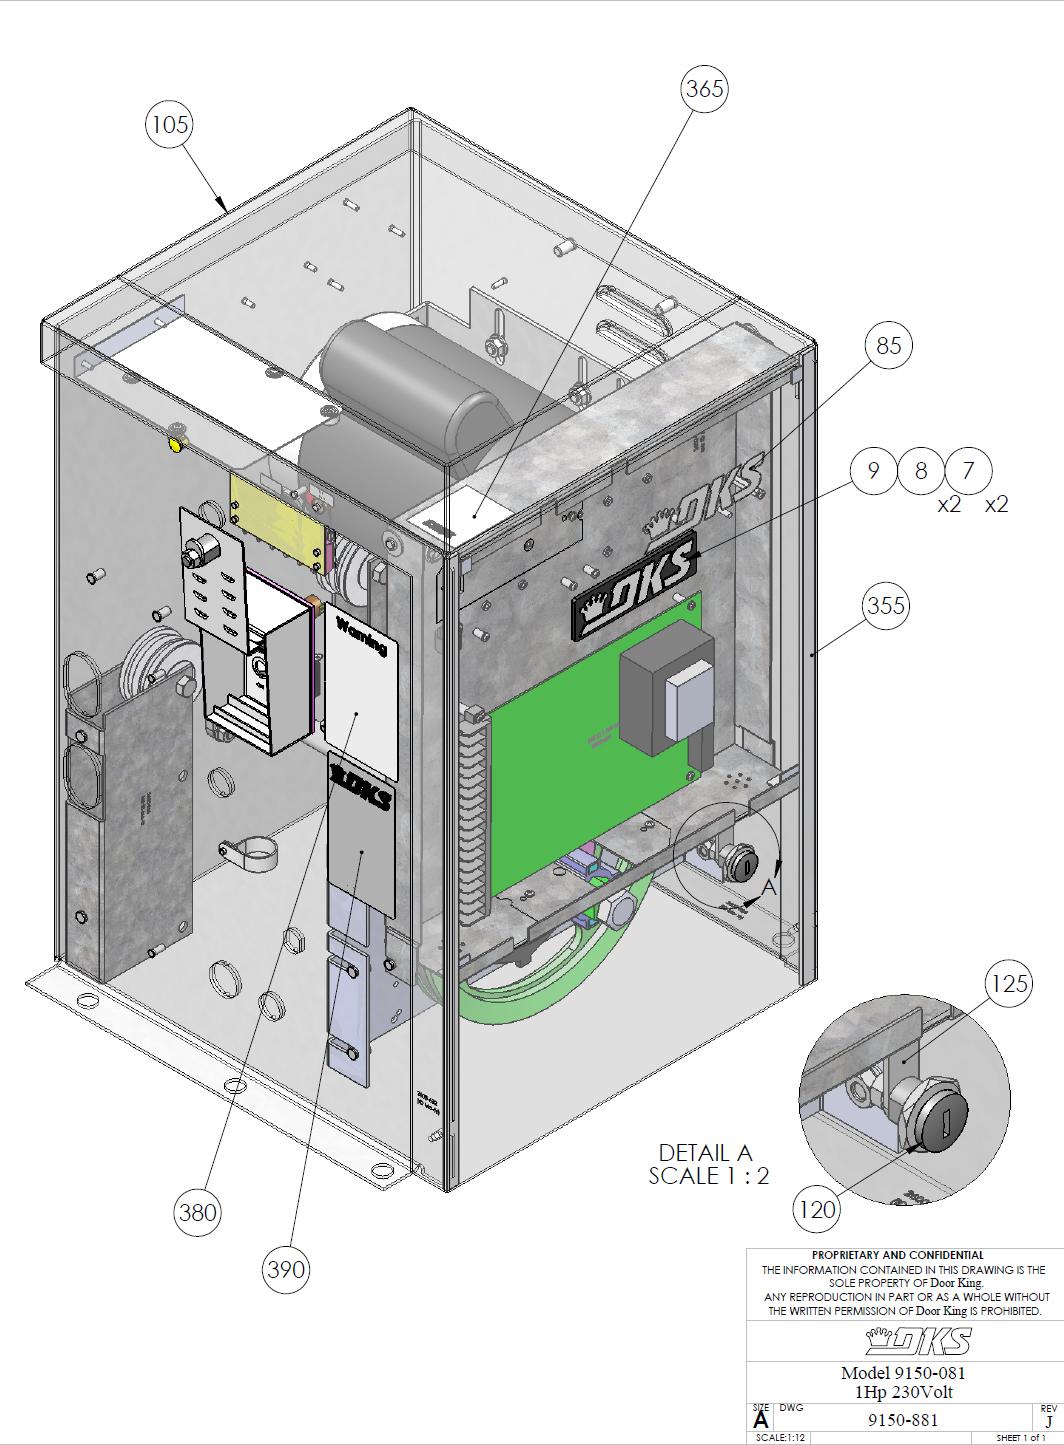 Doorking Parts - 9150-081  sc 1 st  L.A Ornamental & Doorking Parts Slide Gate Operators 9150-081 Doorking Replacement Part